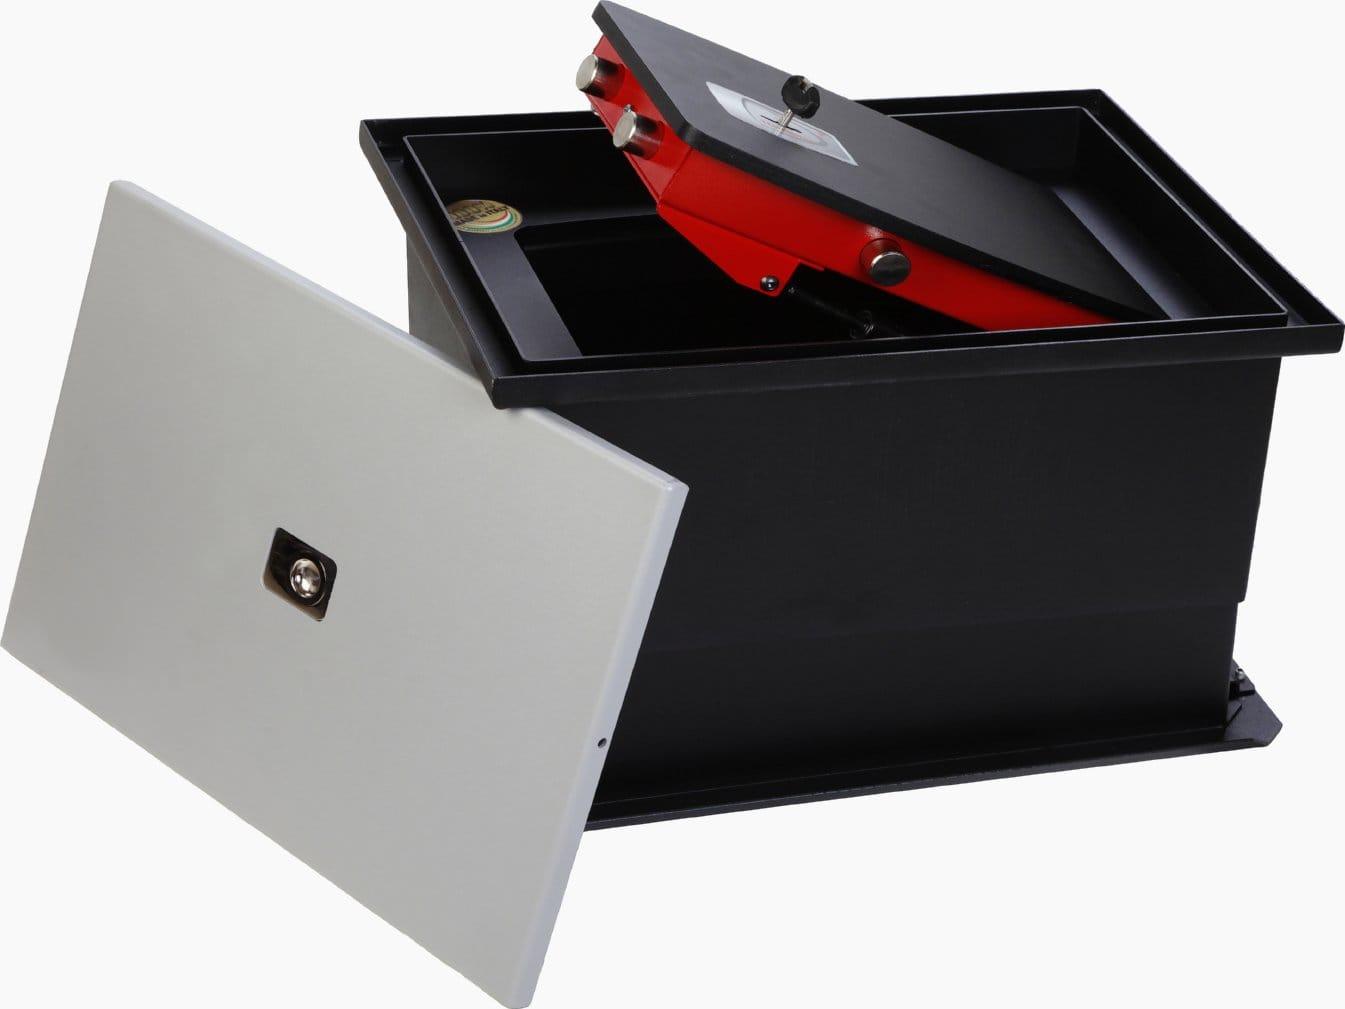 Plafoniere Per Esterno Leroy Merlin : Cassaforte da pavimento nf k prezzi e offerte online leroy merlin